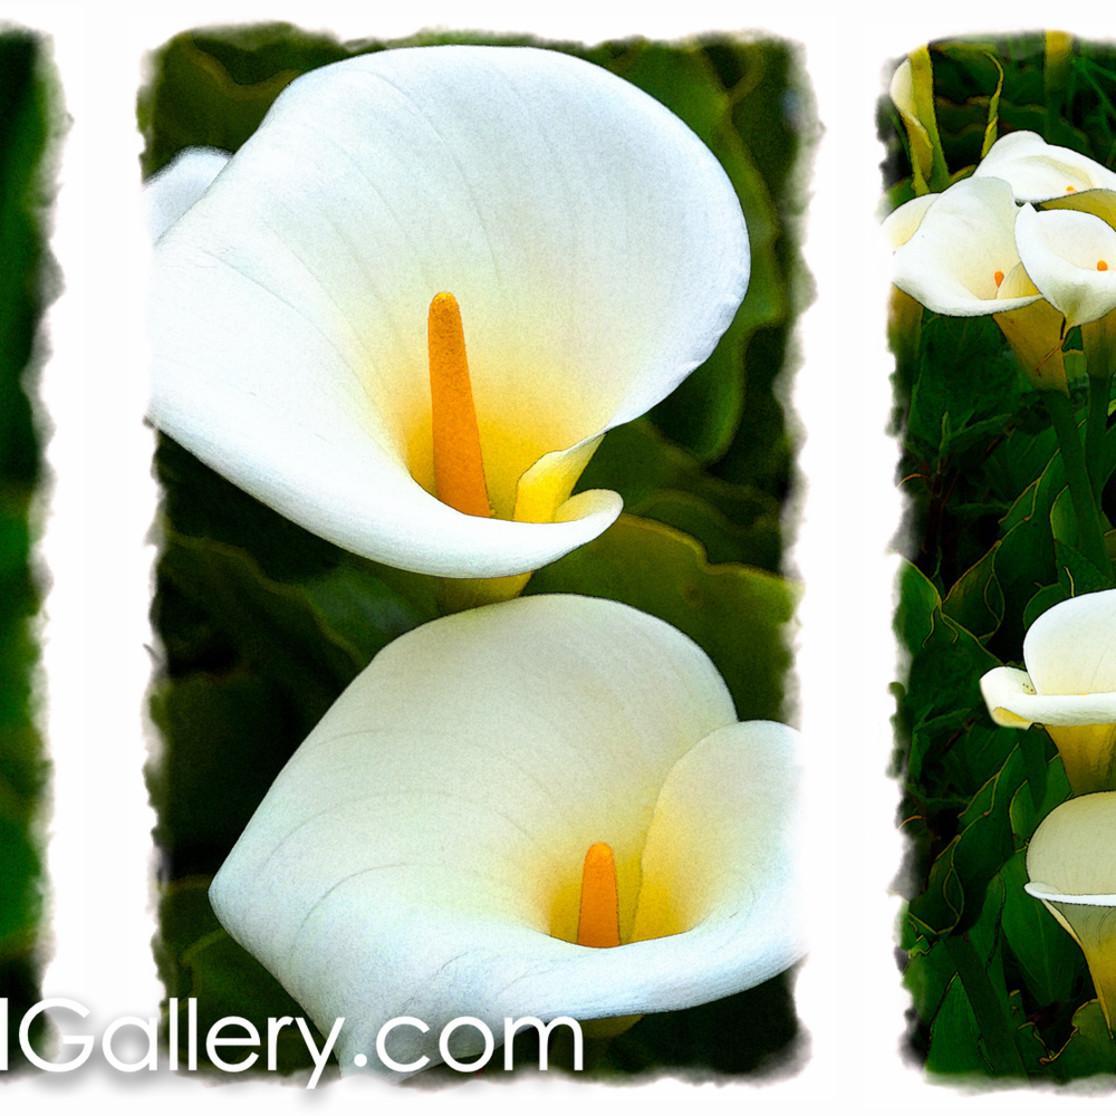 Wild lillies da4sjc